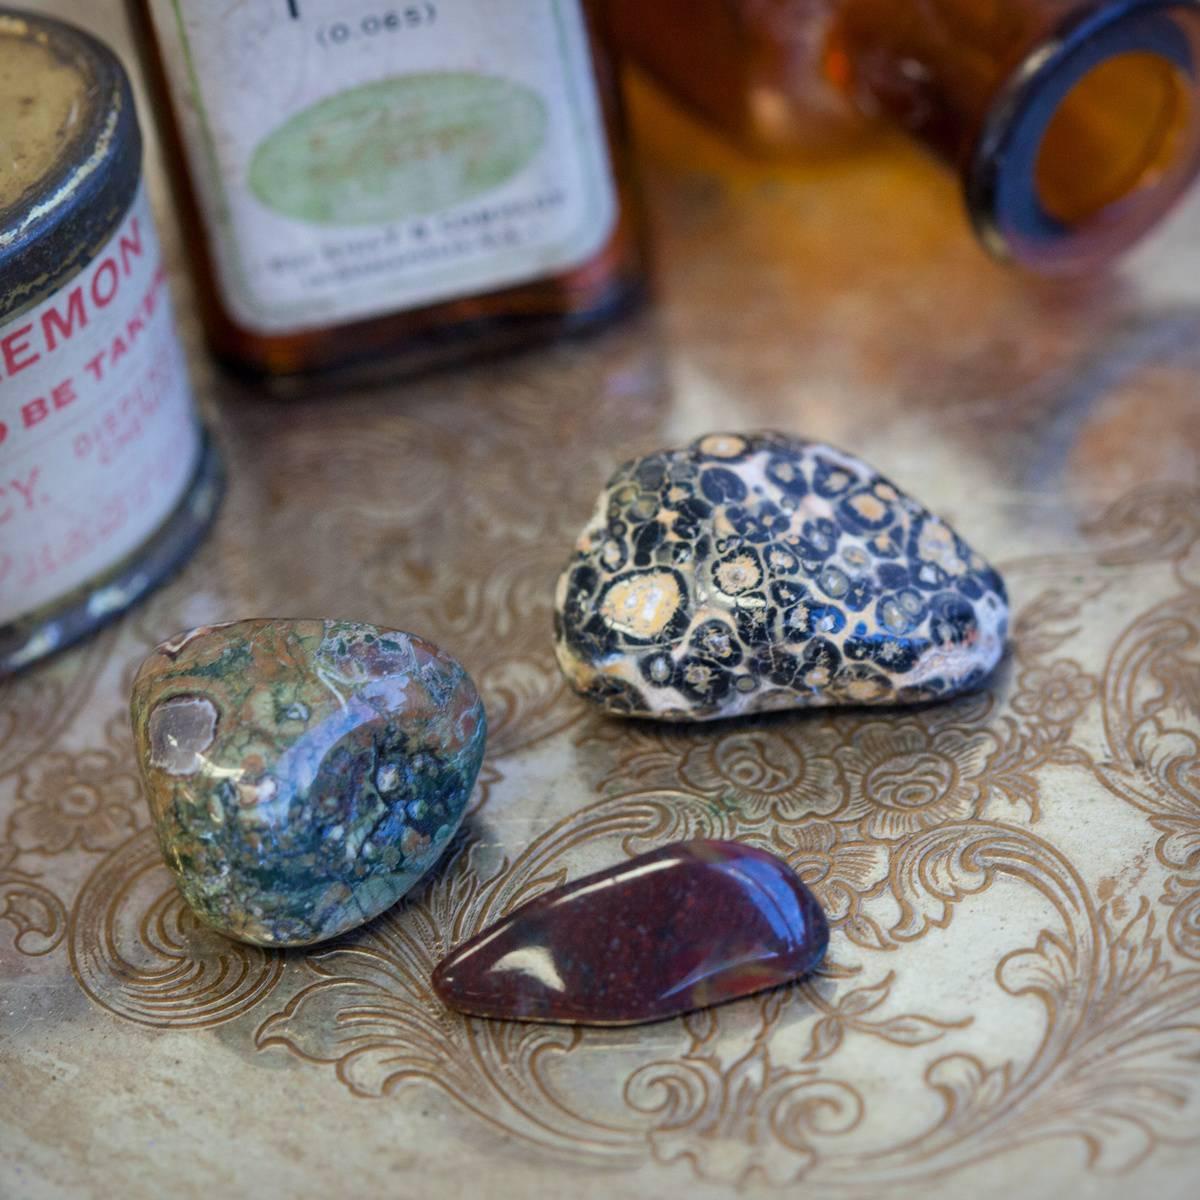 Gem Rx: SG Gemstone Prescription Trio for connecting with your ancestors